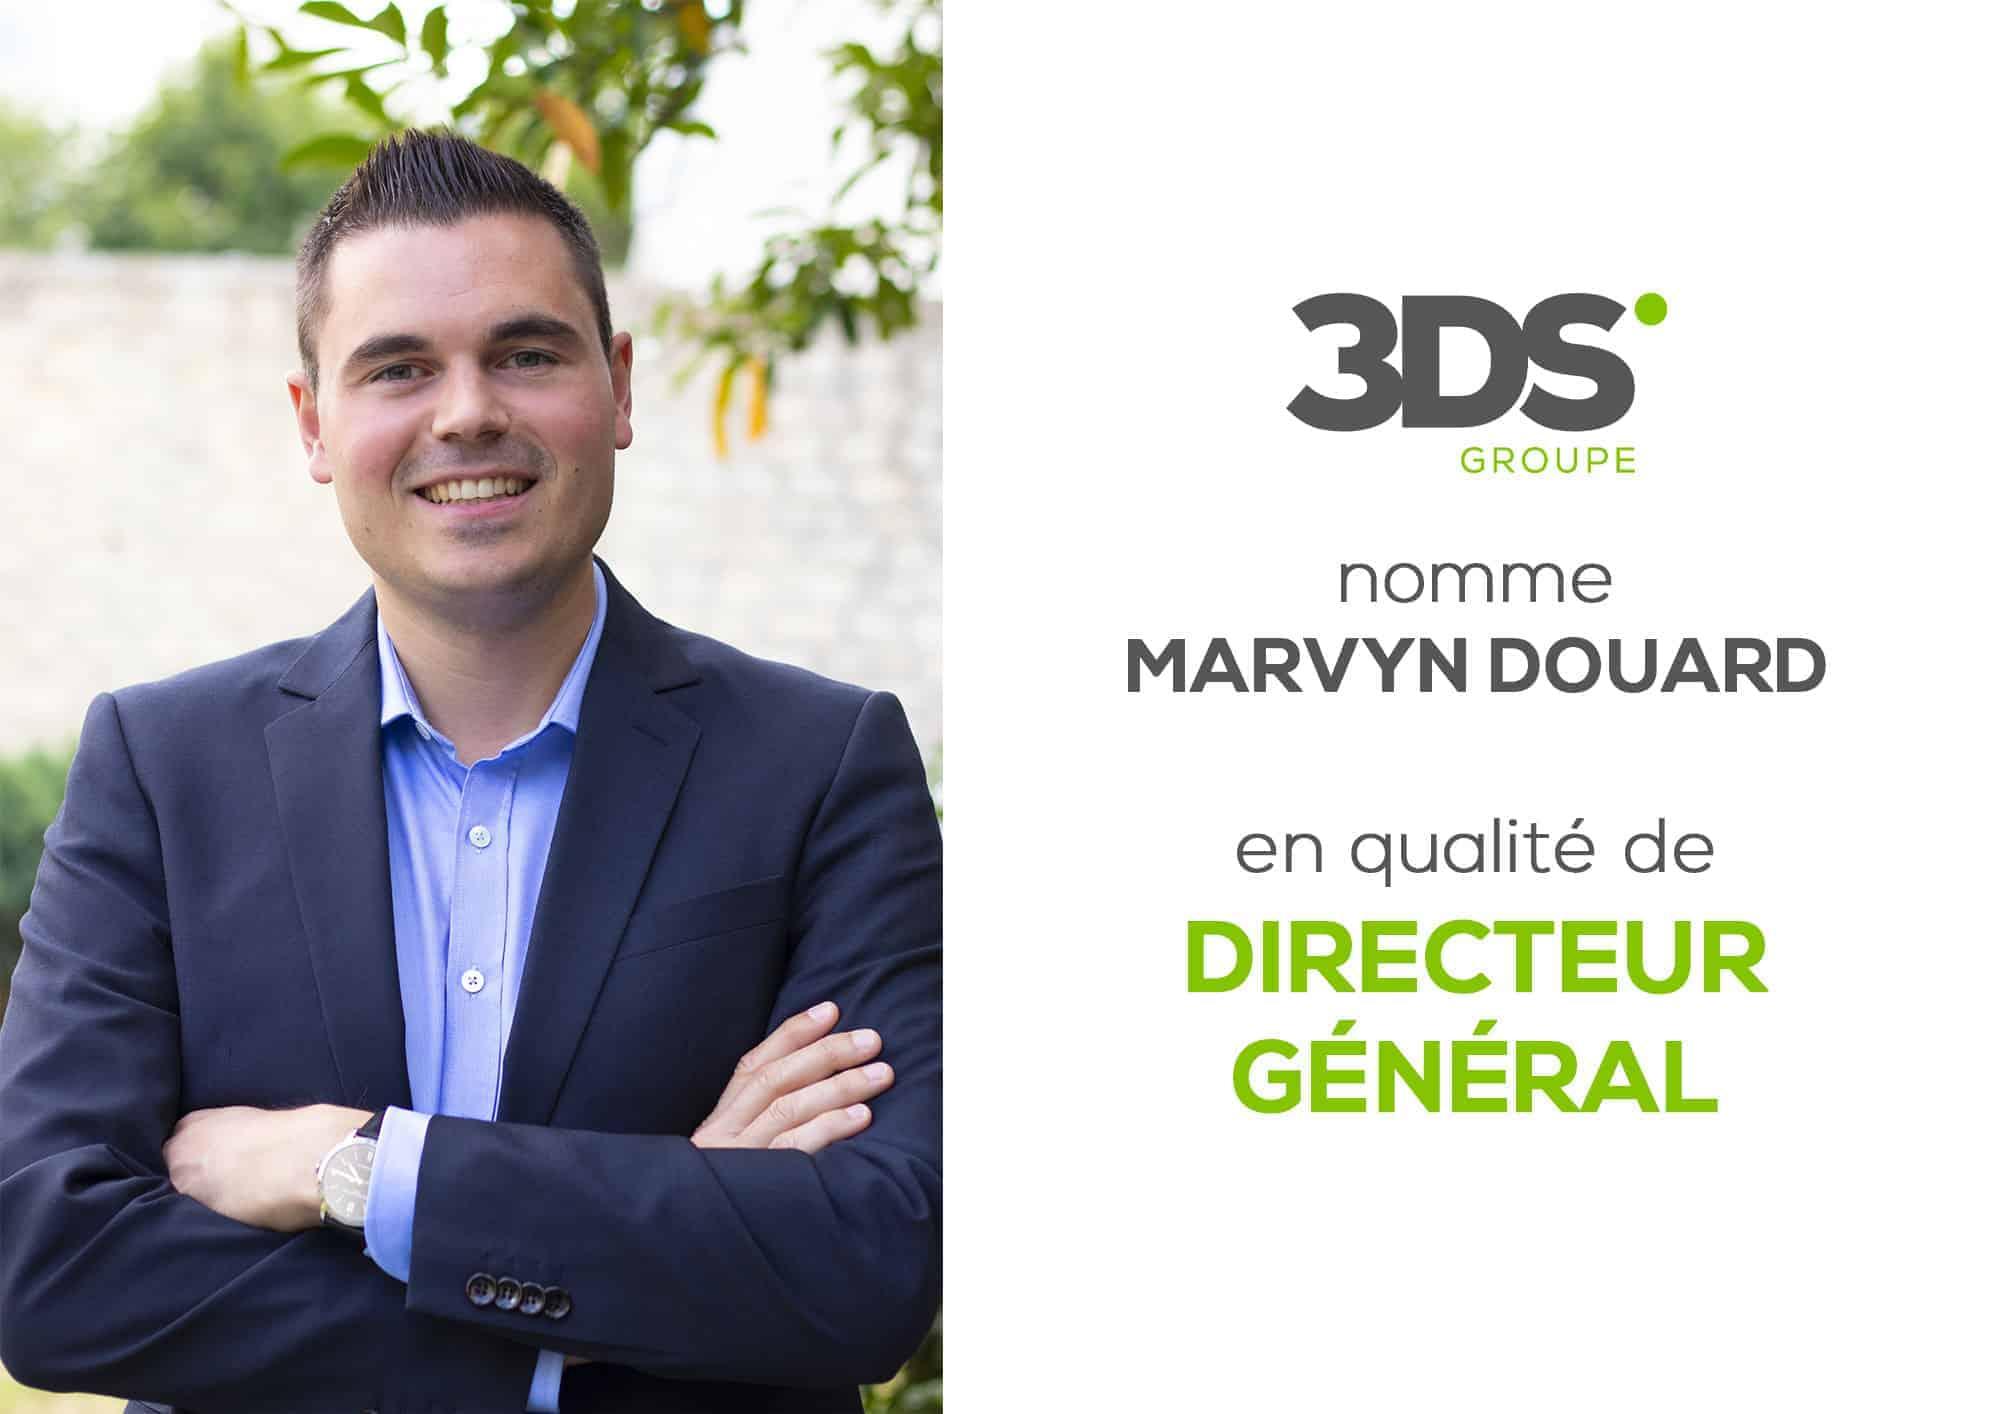 3ds-groupe-marvyn-nomination